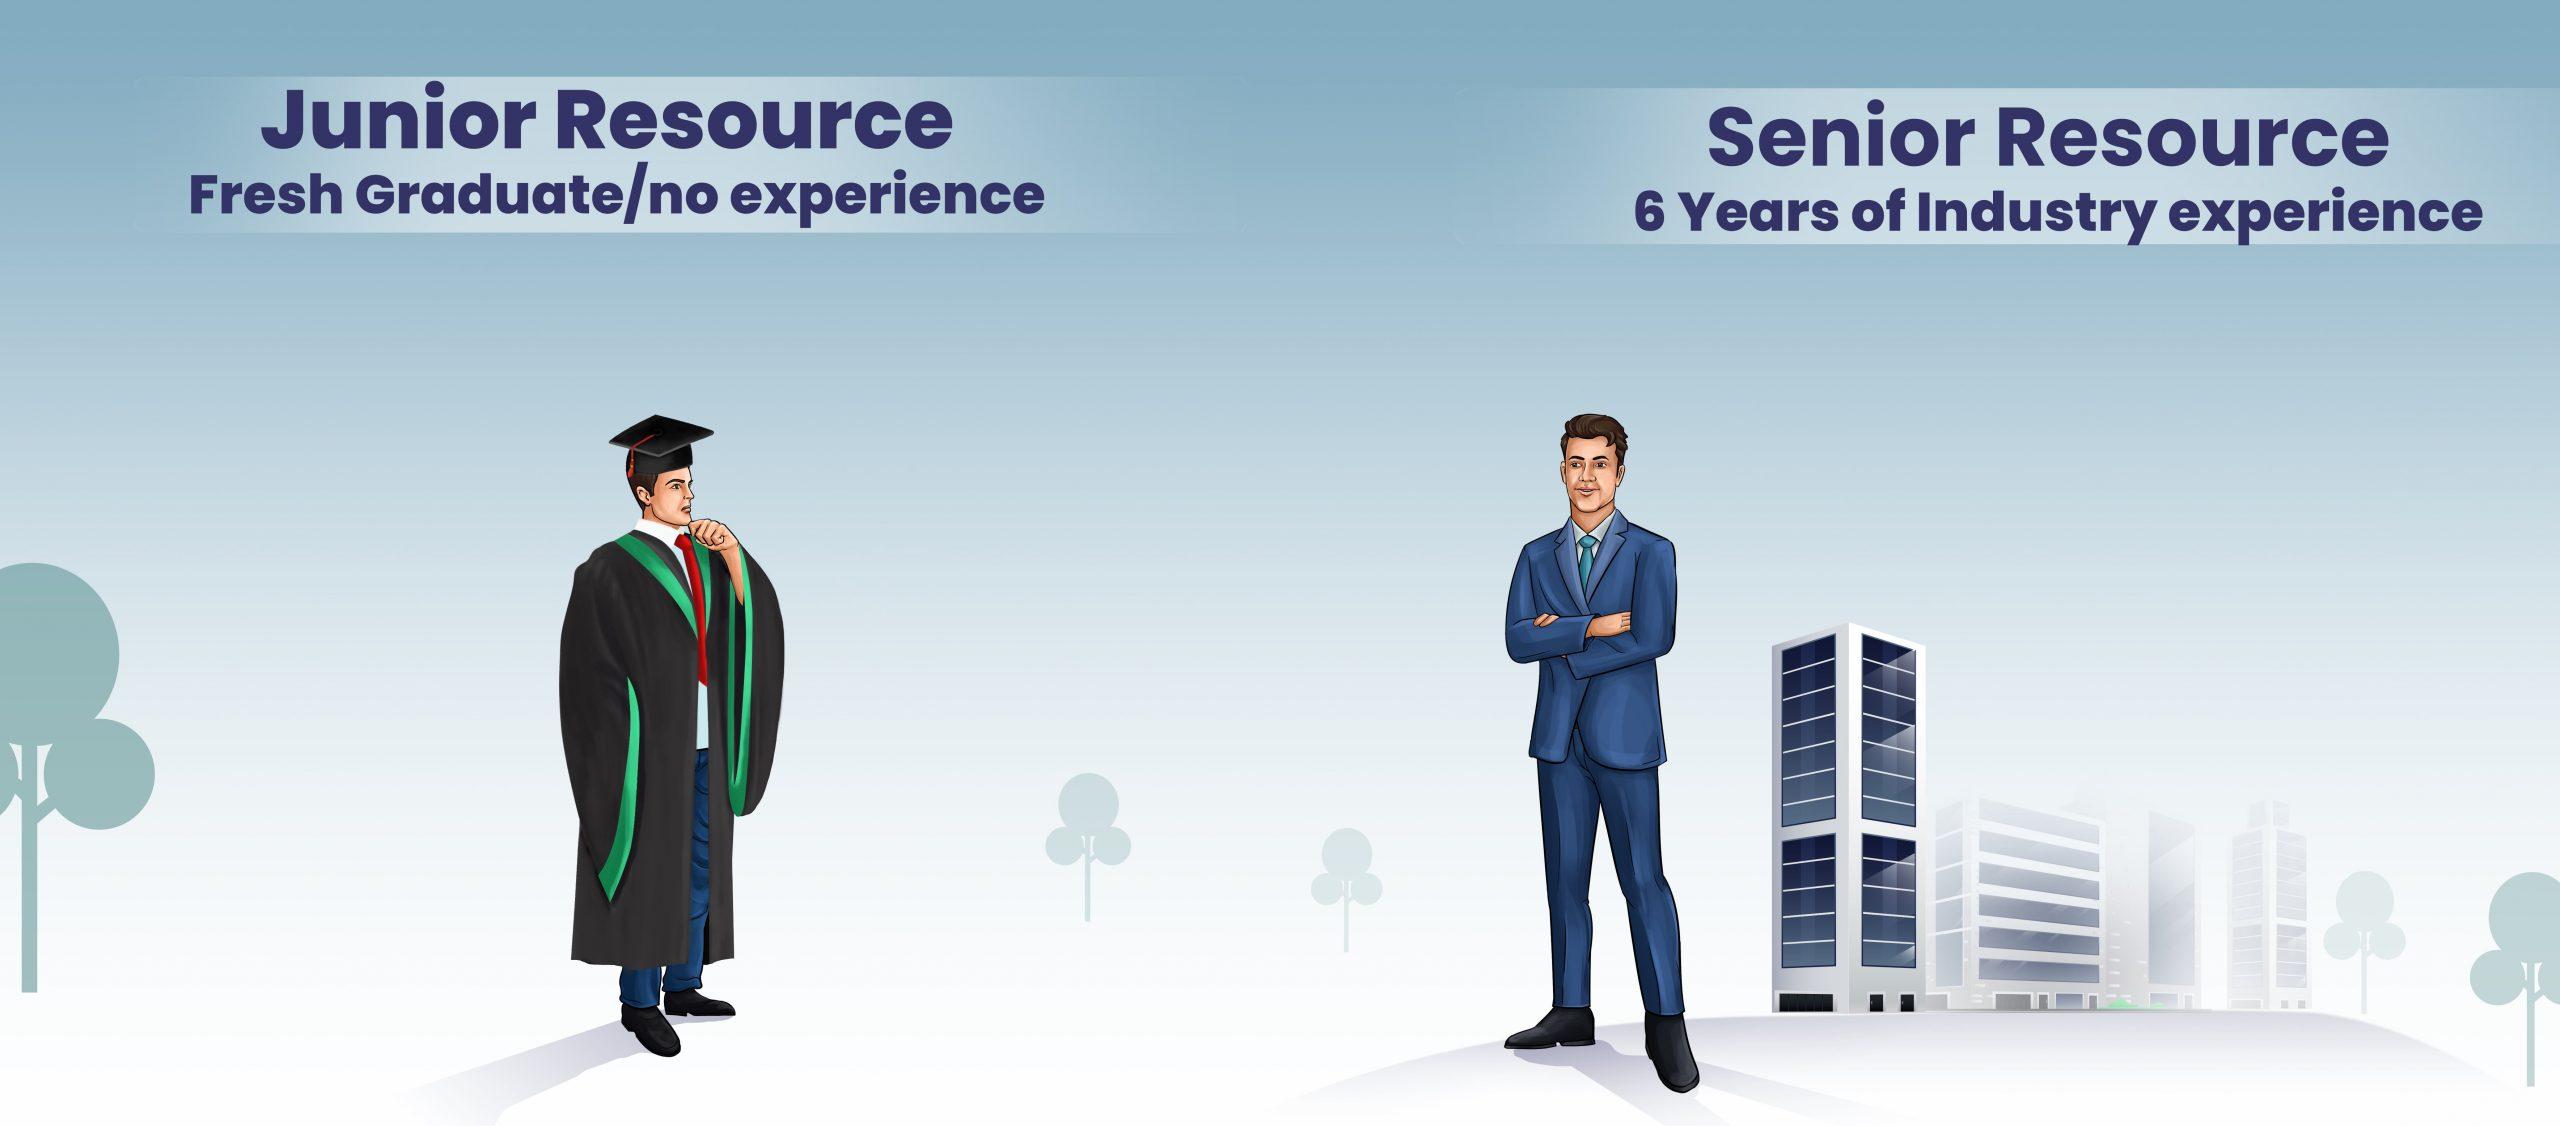 Junior Resource and Senior Resource